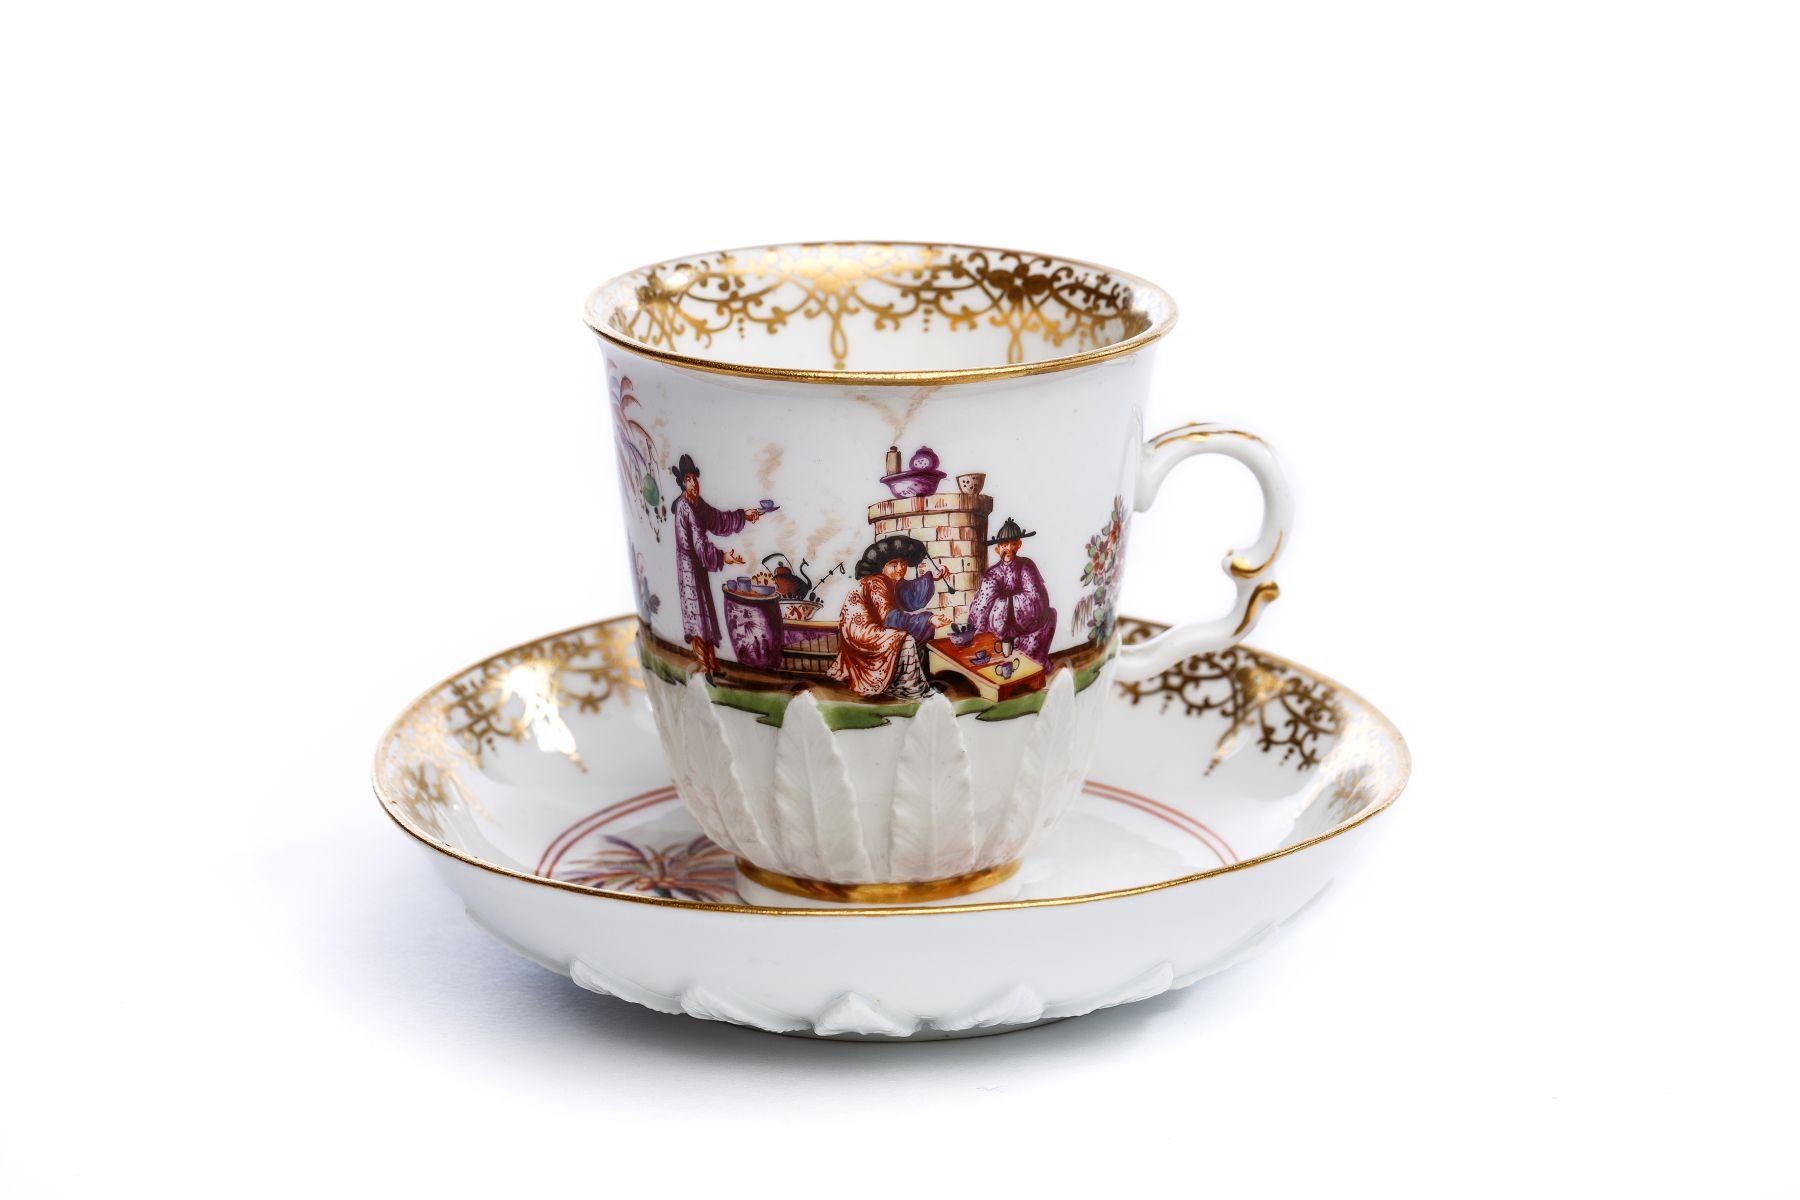 #11 Handled beaker with saucer, Meissen 1730/35 | Henkelbecher mit Unterschale, Meissen 1730/35 Image